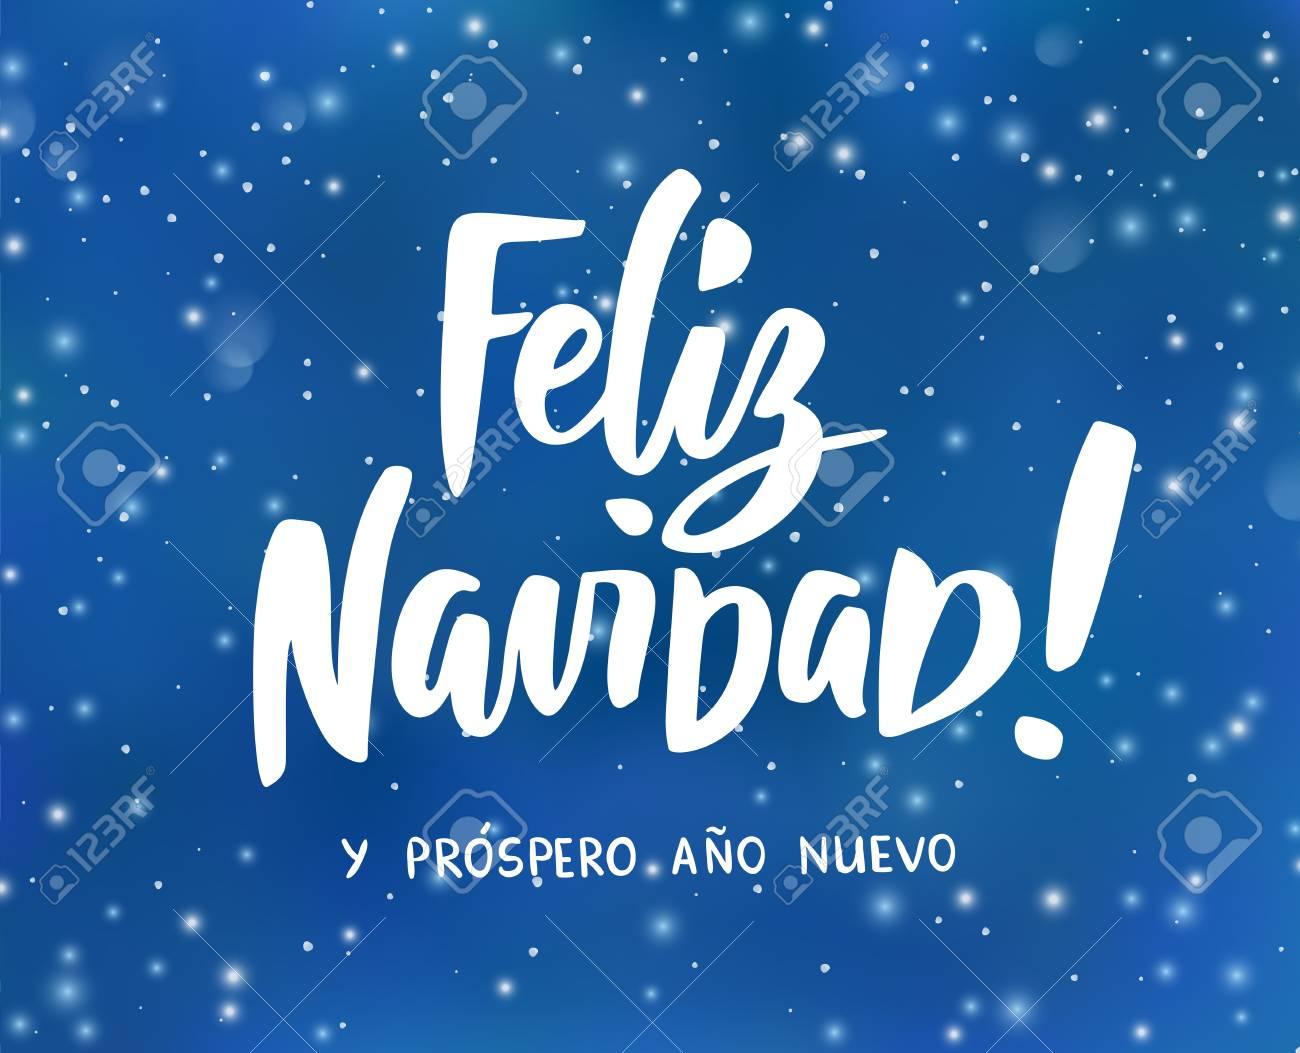 Feliz Navidad Y Prospero Ano Nuevo Spanish Merry Christmas Stock